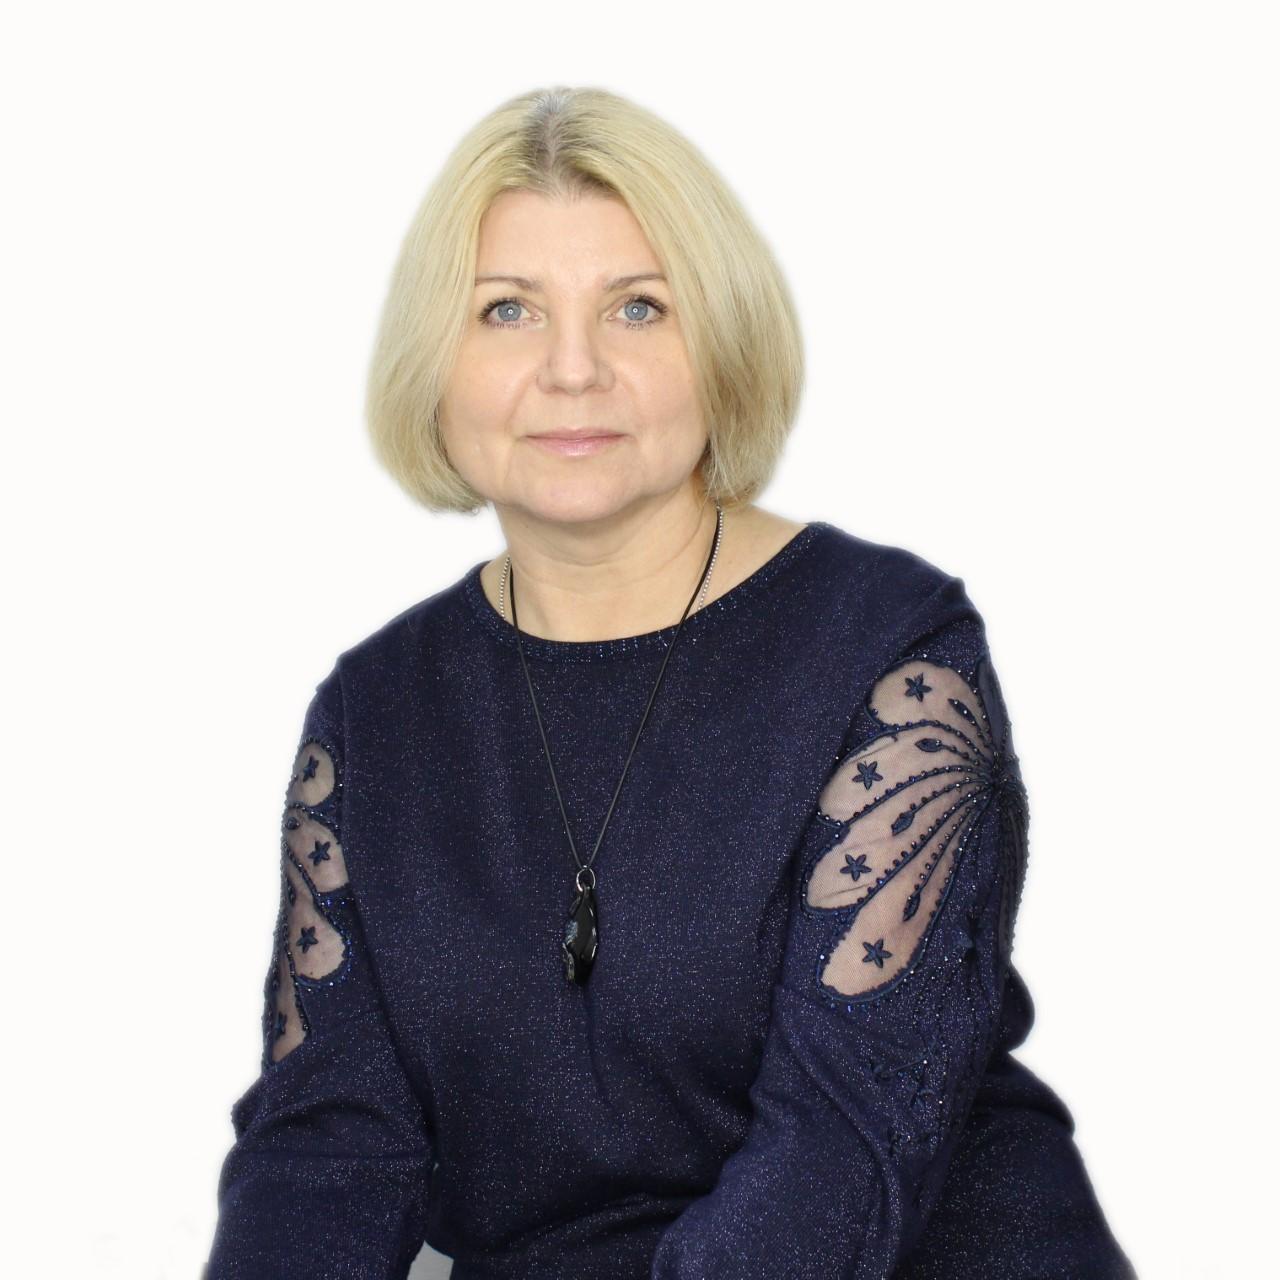 Гайченко (Теряева) Светлана Владимировна